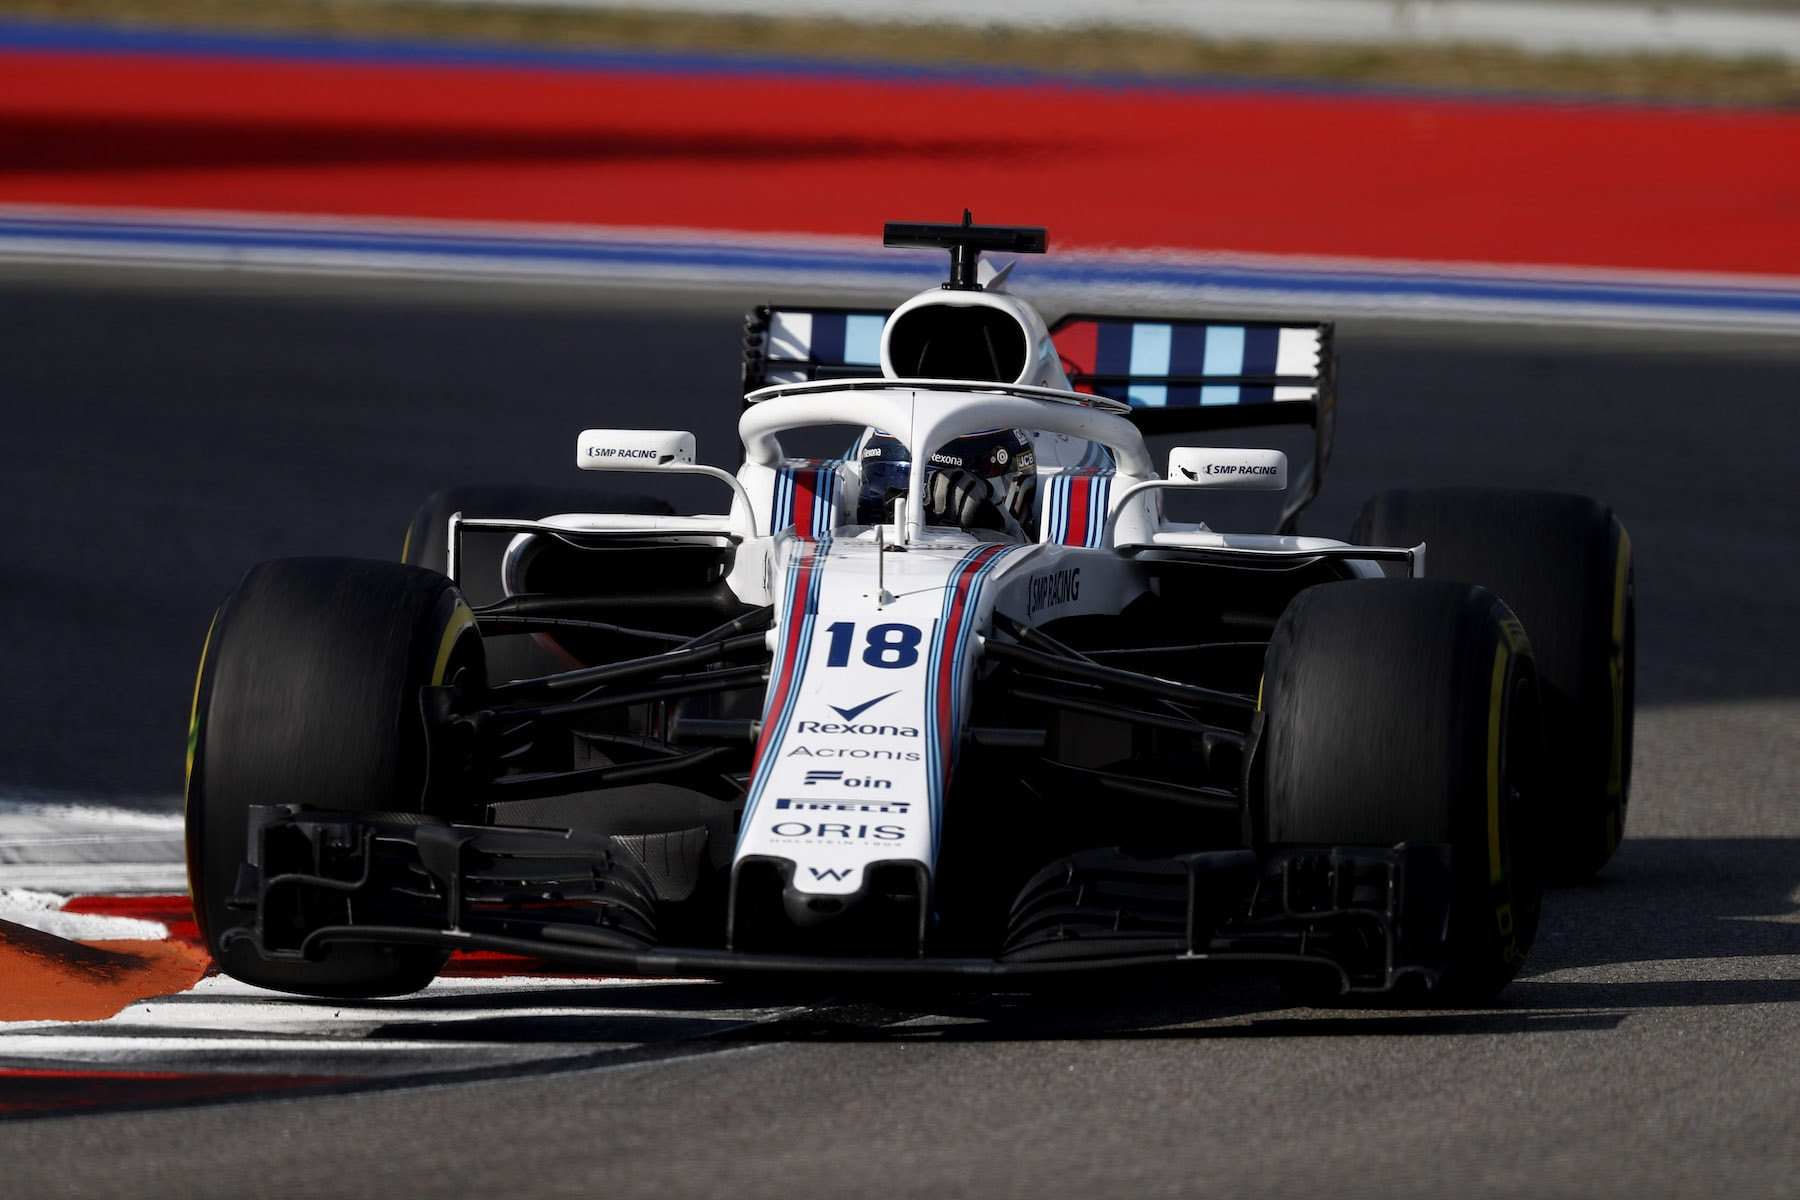 H 2018 Lance Stroll | Williams FW41 | 2018 Russian GP 1 copy.jpg